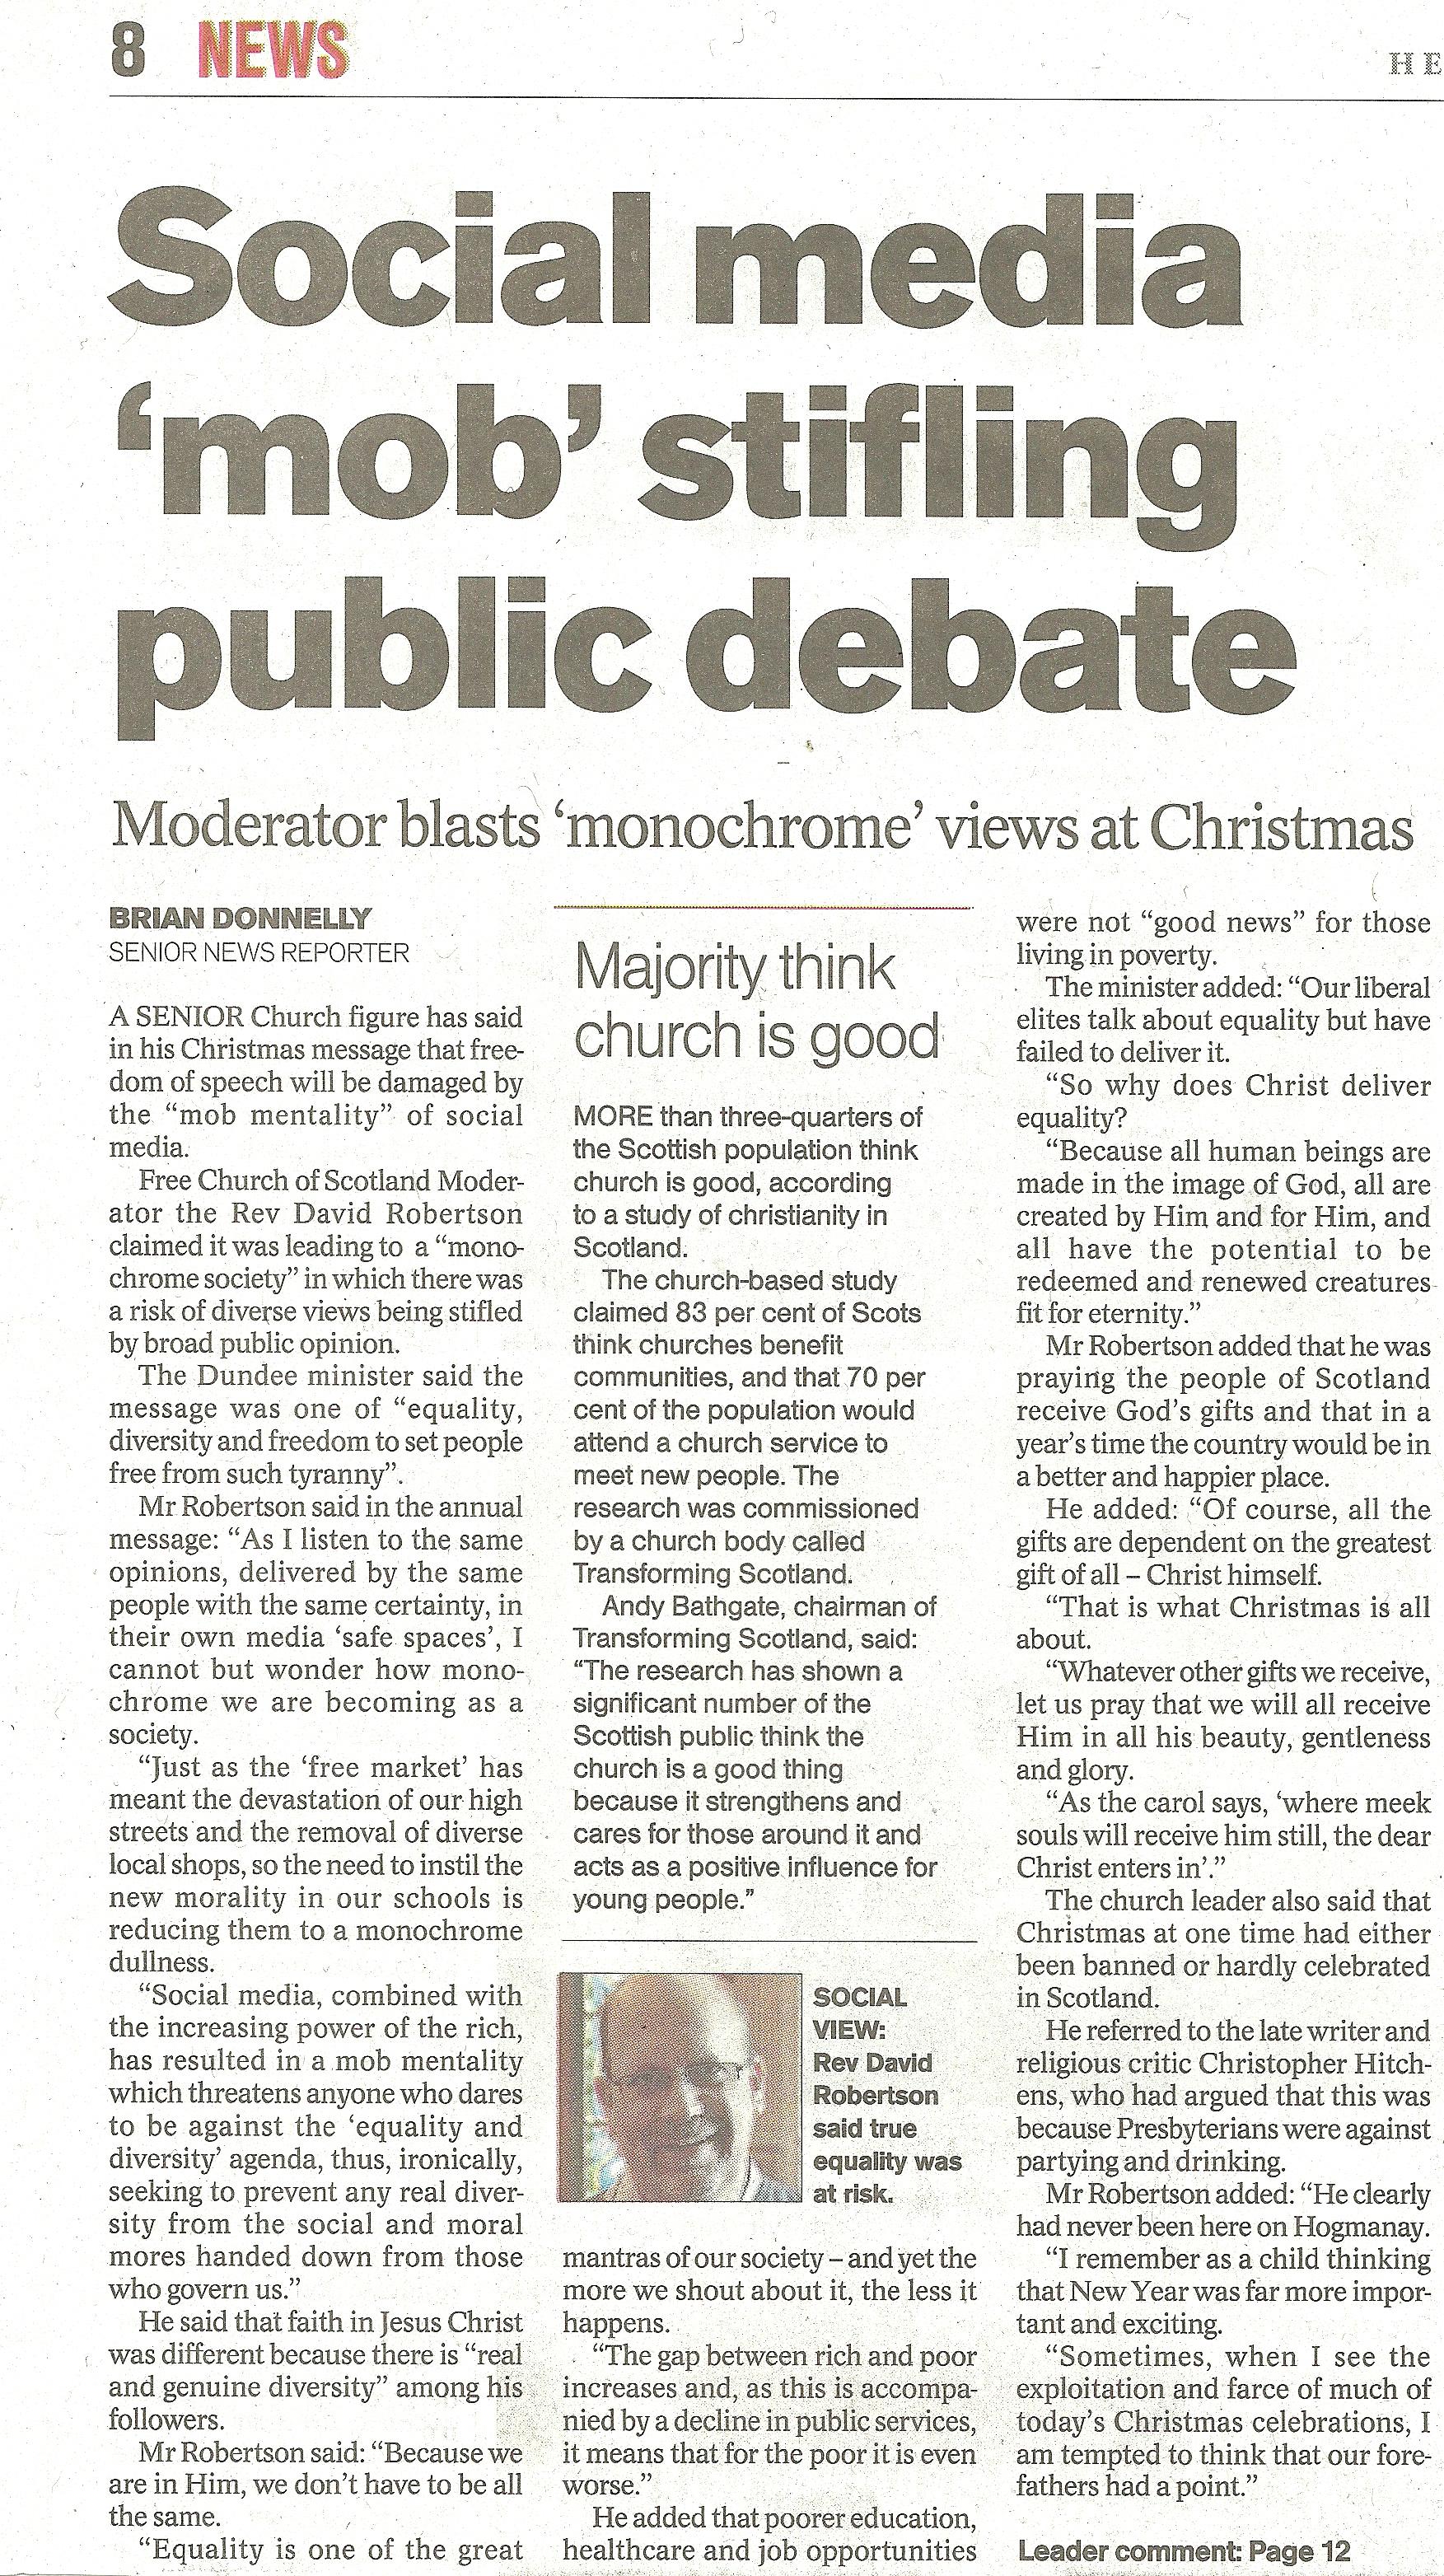 Herald 22-12-15 - Social Media mob stifling public debate